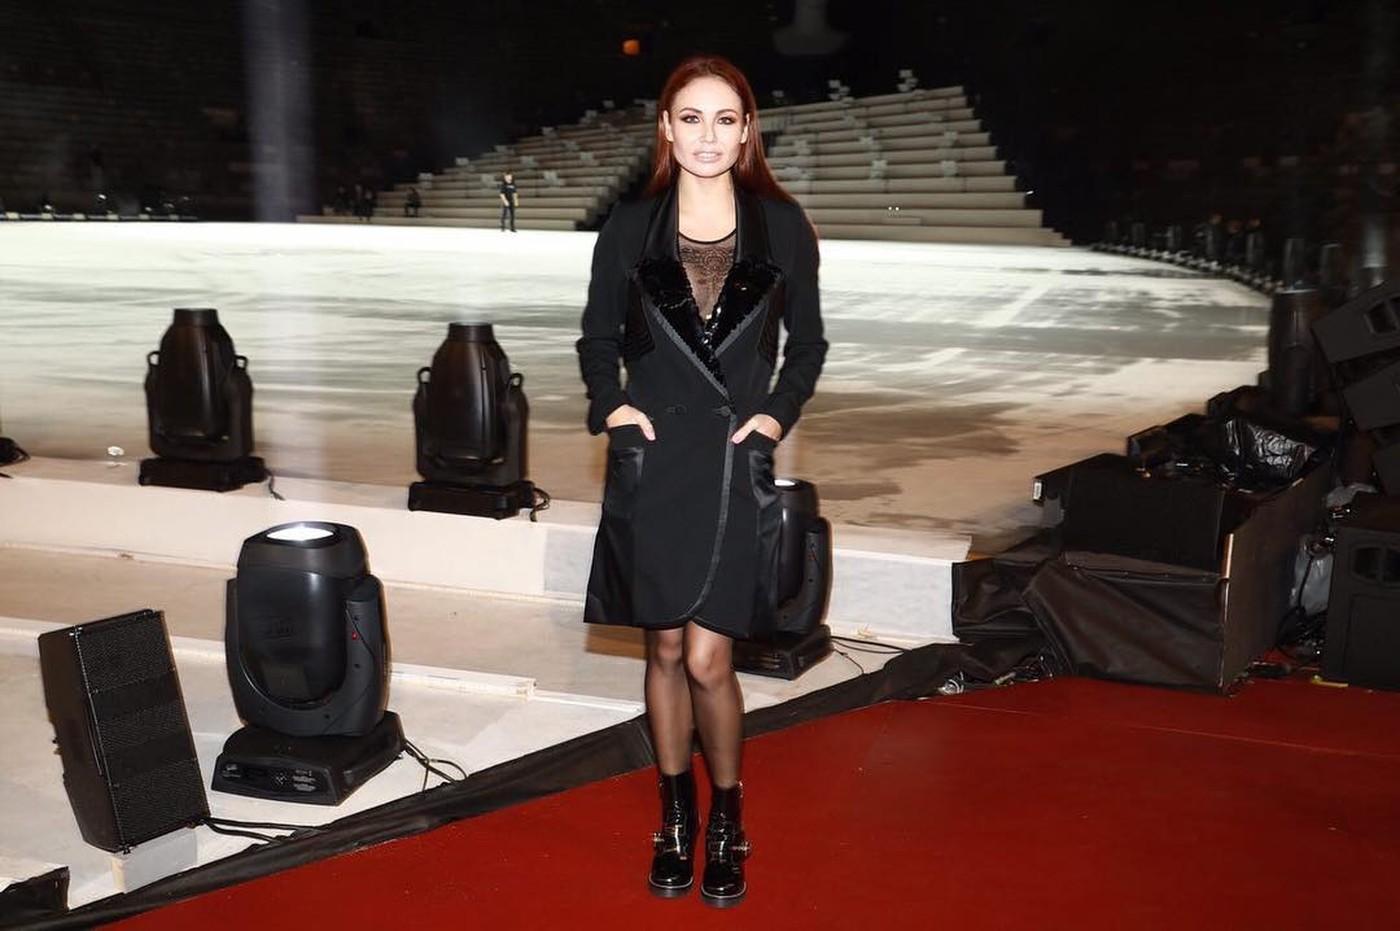 http://i42-cdn.woman.ru/images/gallery/a/2/g_a2beefb8f69e51726dfb1e8089955ea7_2_1400x1100.jpg?02